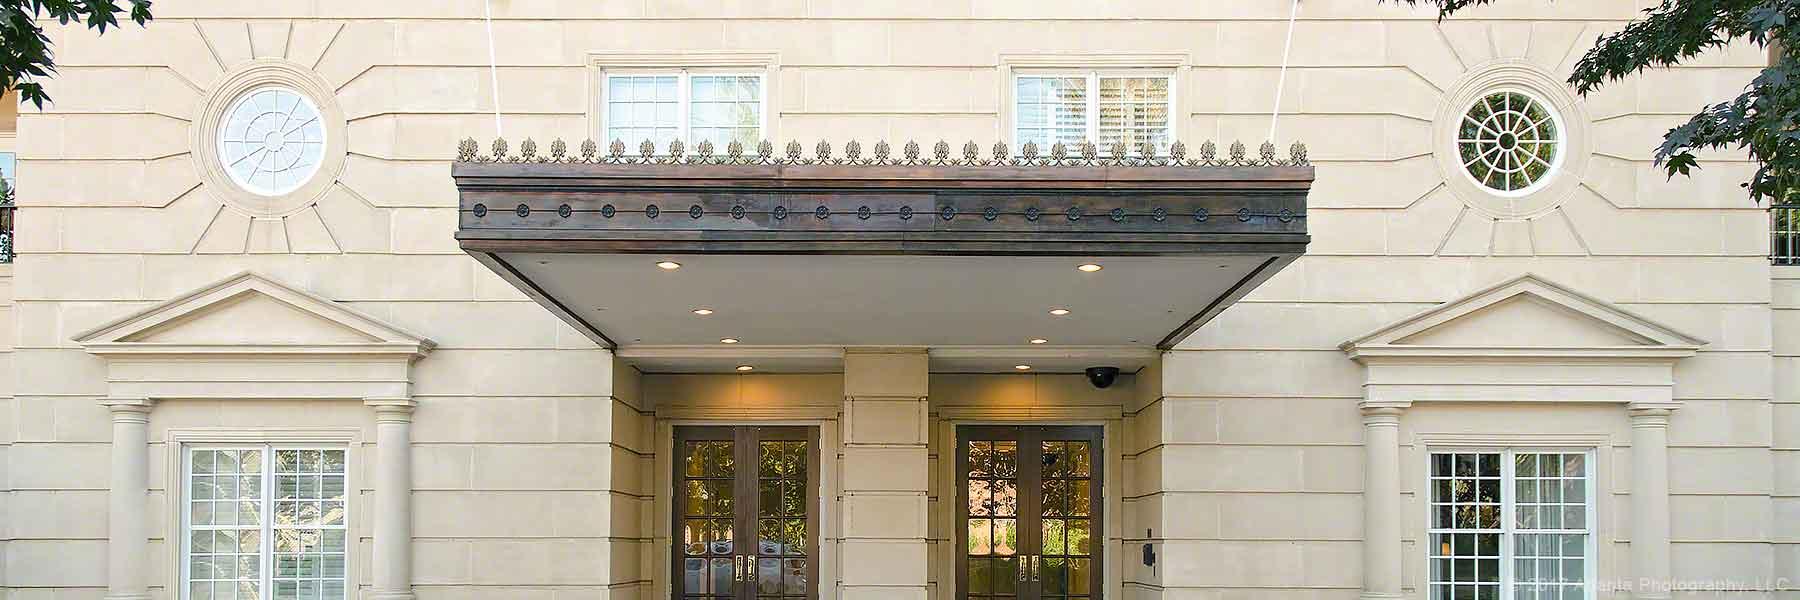 The Winston On Peachtree Condominium Building 3657